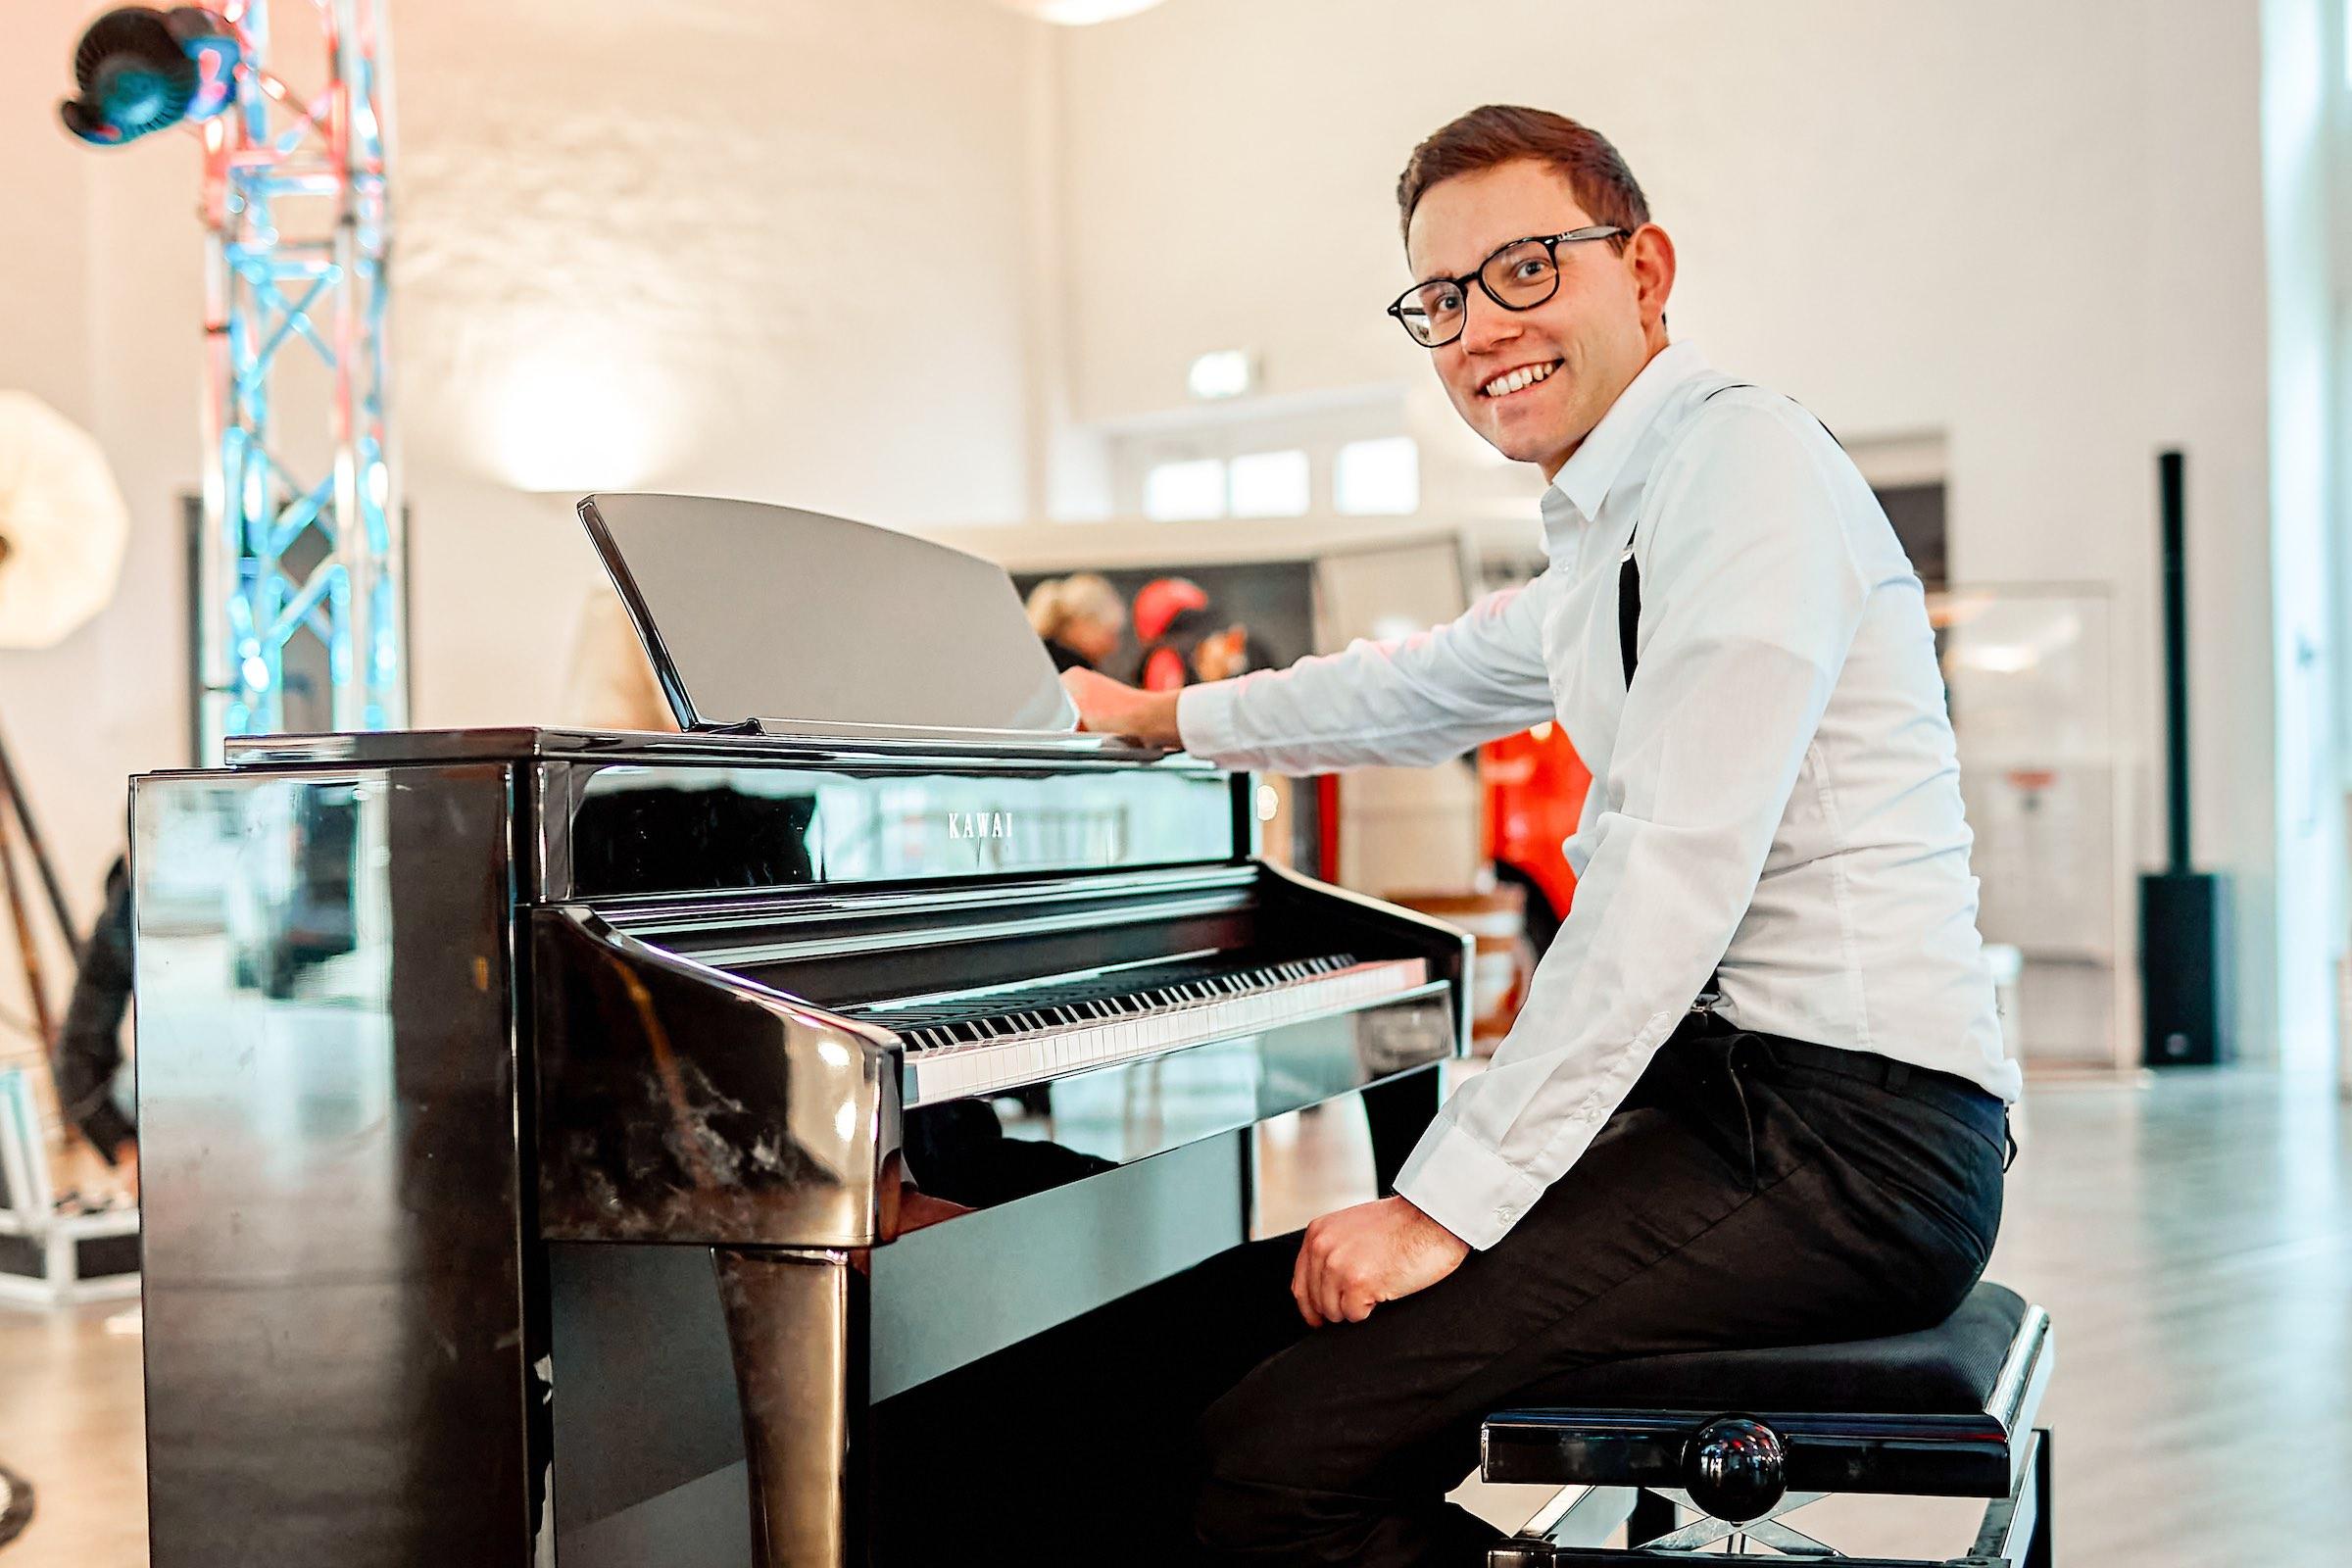 Pianist   Klavierspieler   Barpiano   Barpianist   Hannover   Trauung   Hochzeit   Empfang   Sektempfang   Dinner   Kirche   Buchen   Mieten   Anfragen   Alexander   Barsch   Lehmann   Eventservice